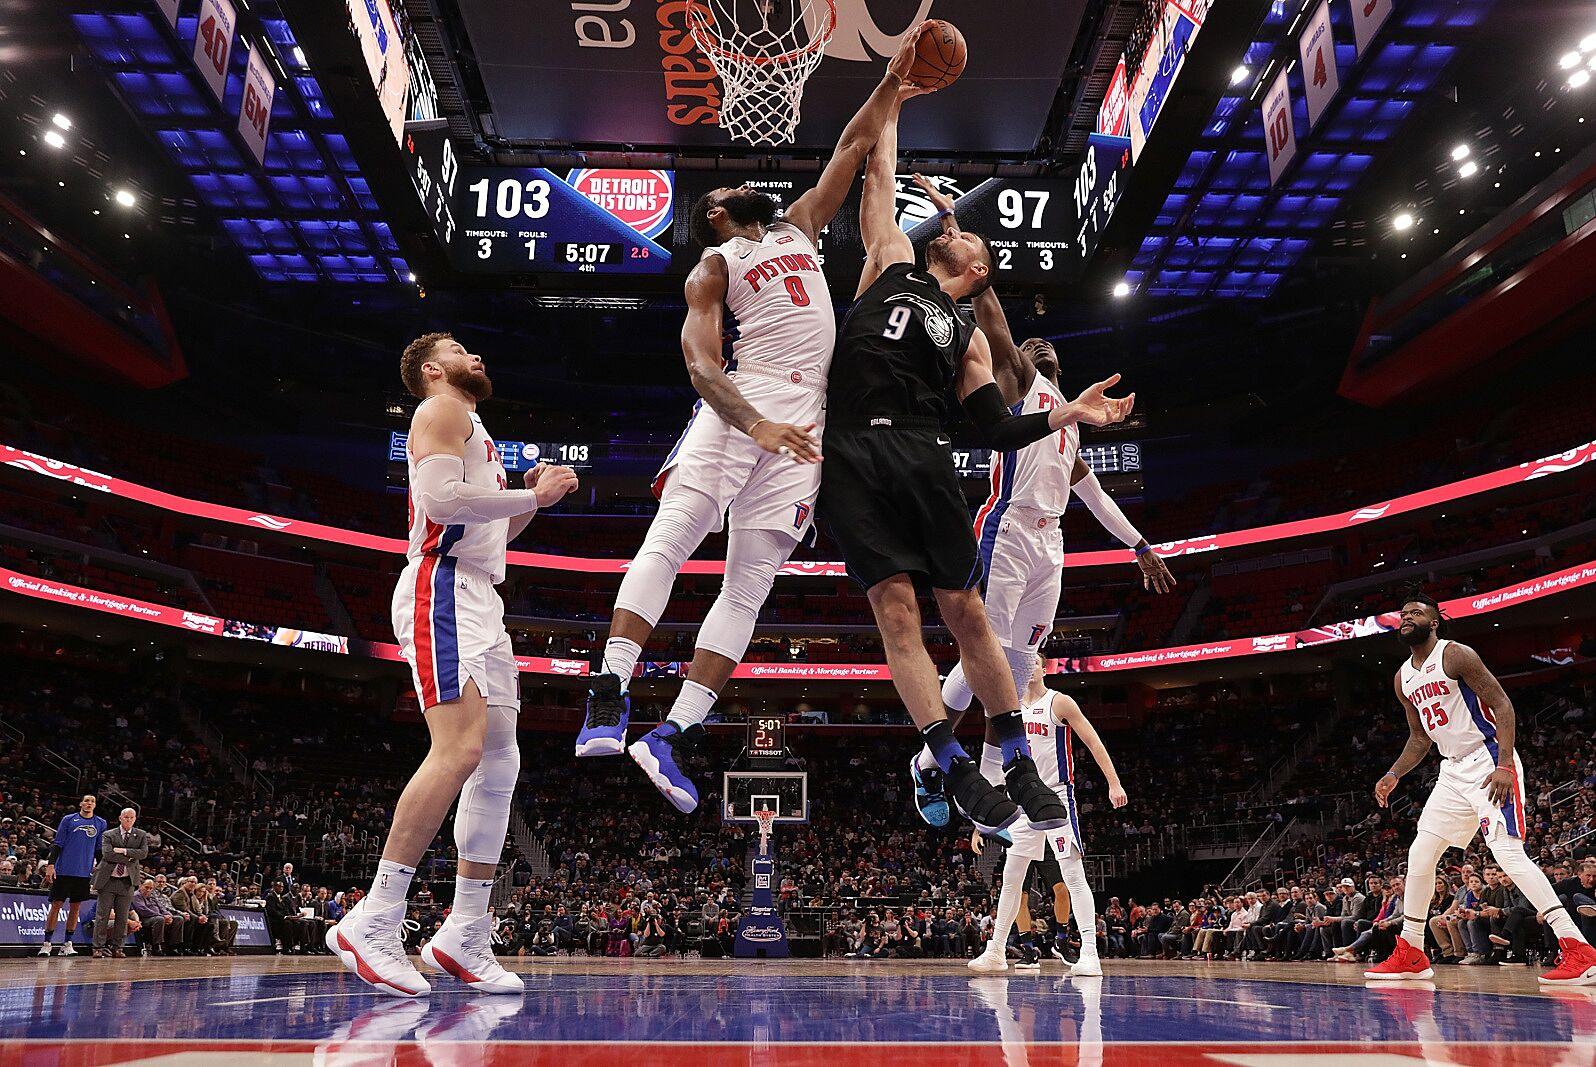 Detroit Pistons vs. Orlando Magic 2019-20 season preview